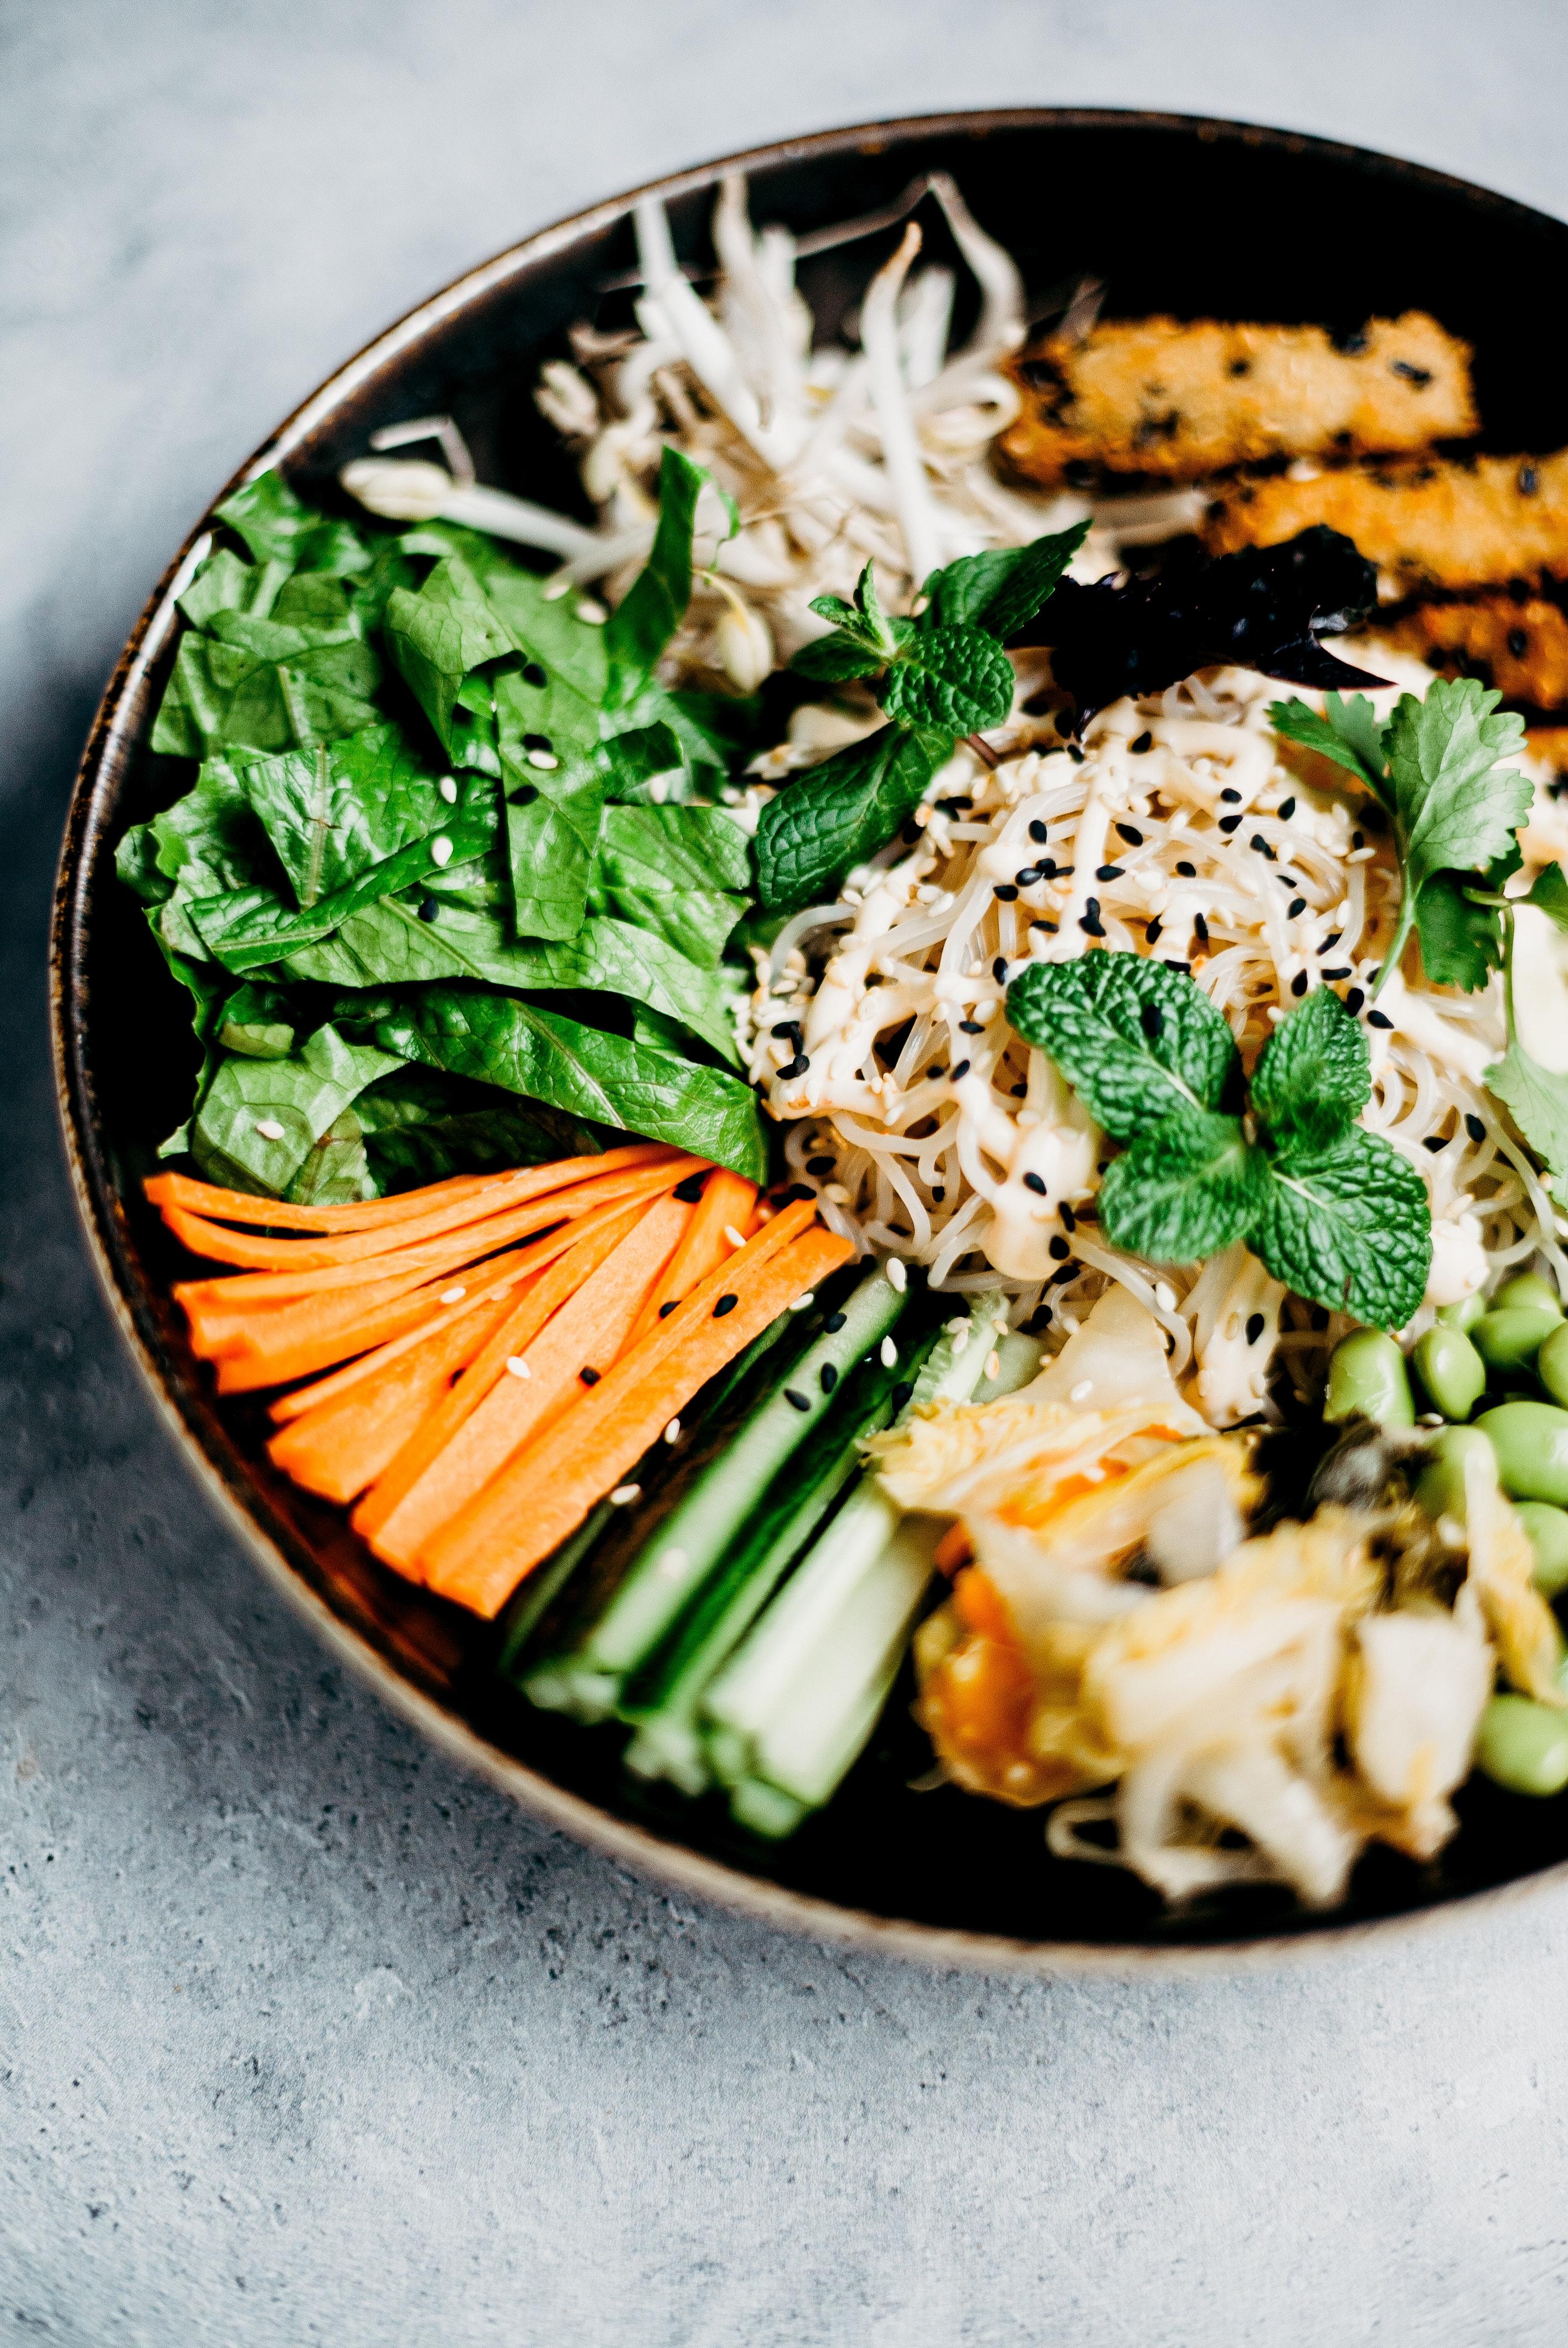 photo-of-vegetables-on-bowl-3297363.jpg